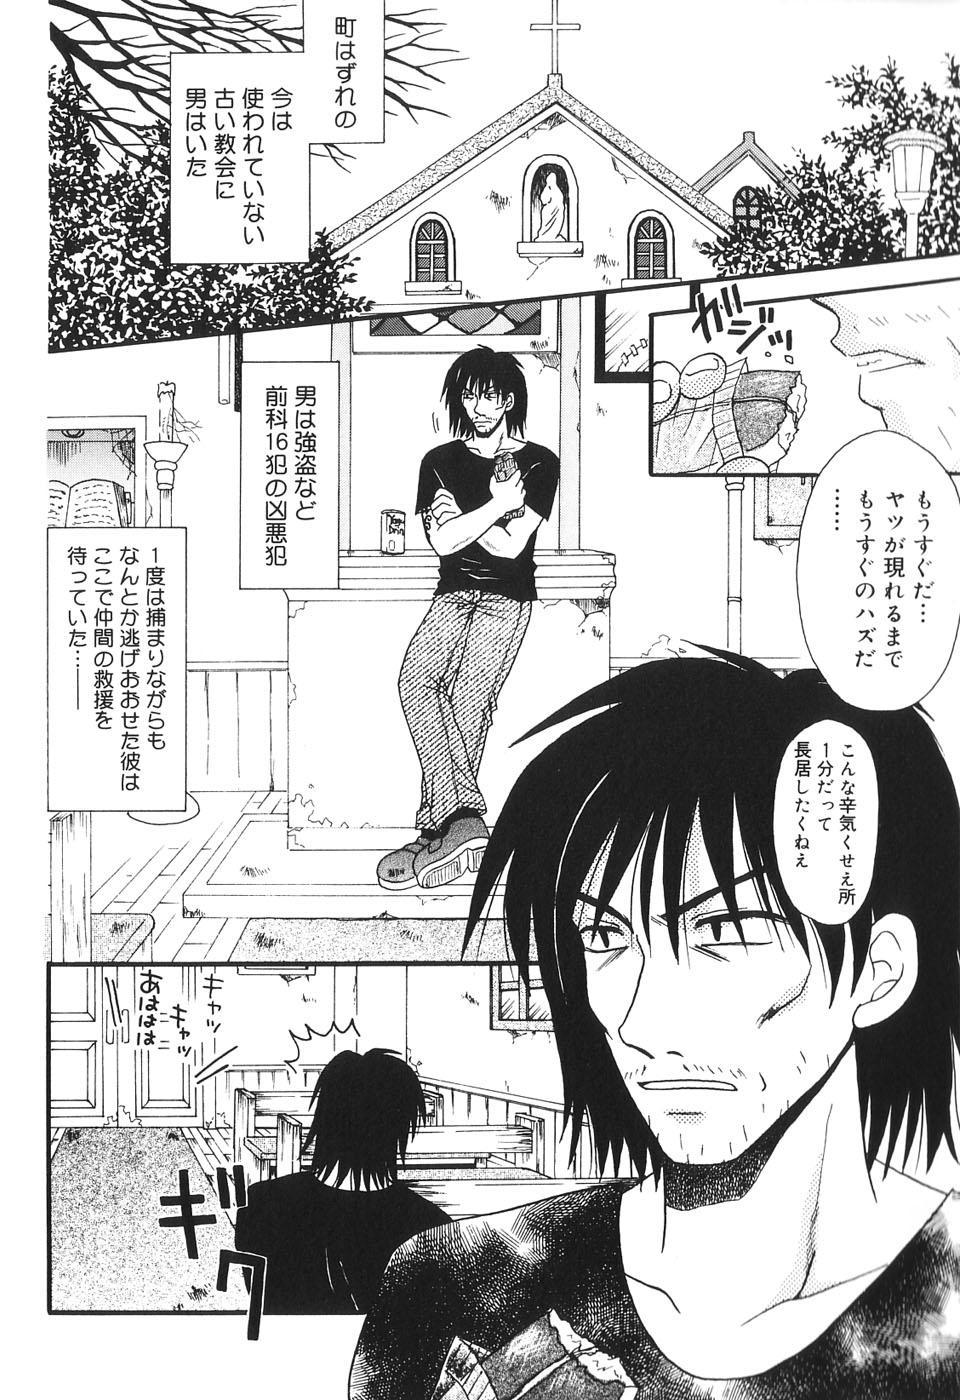 Musoubana 74